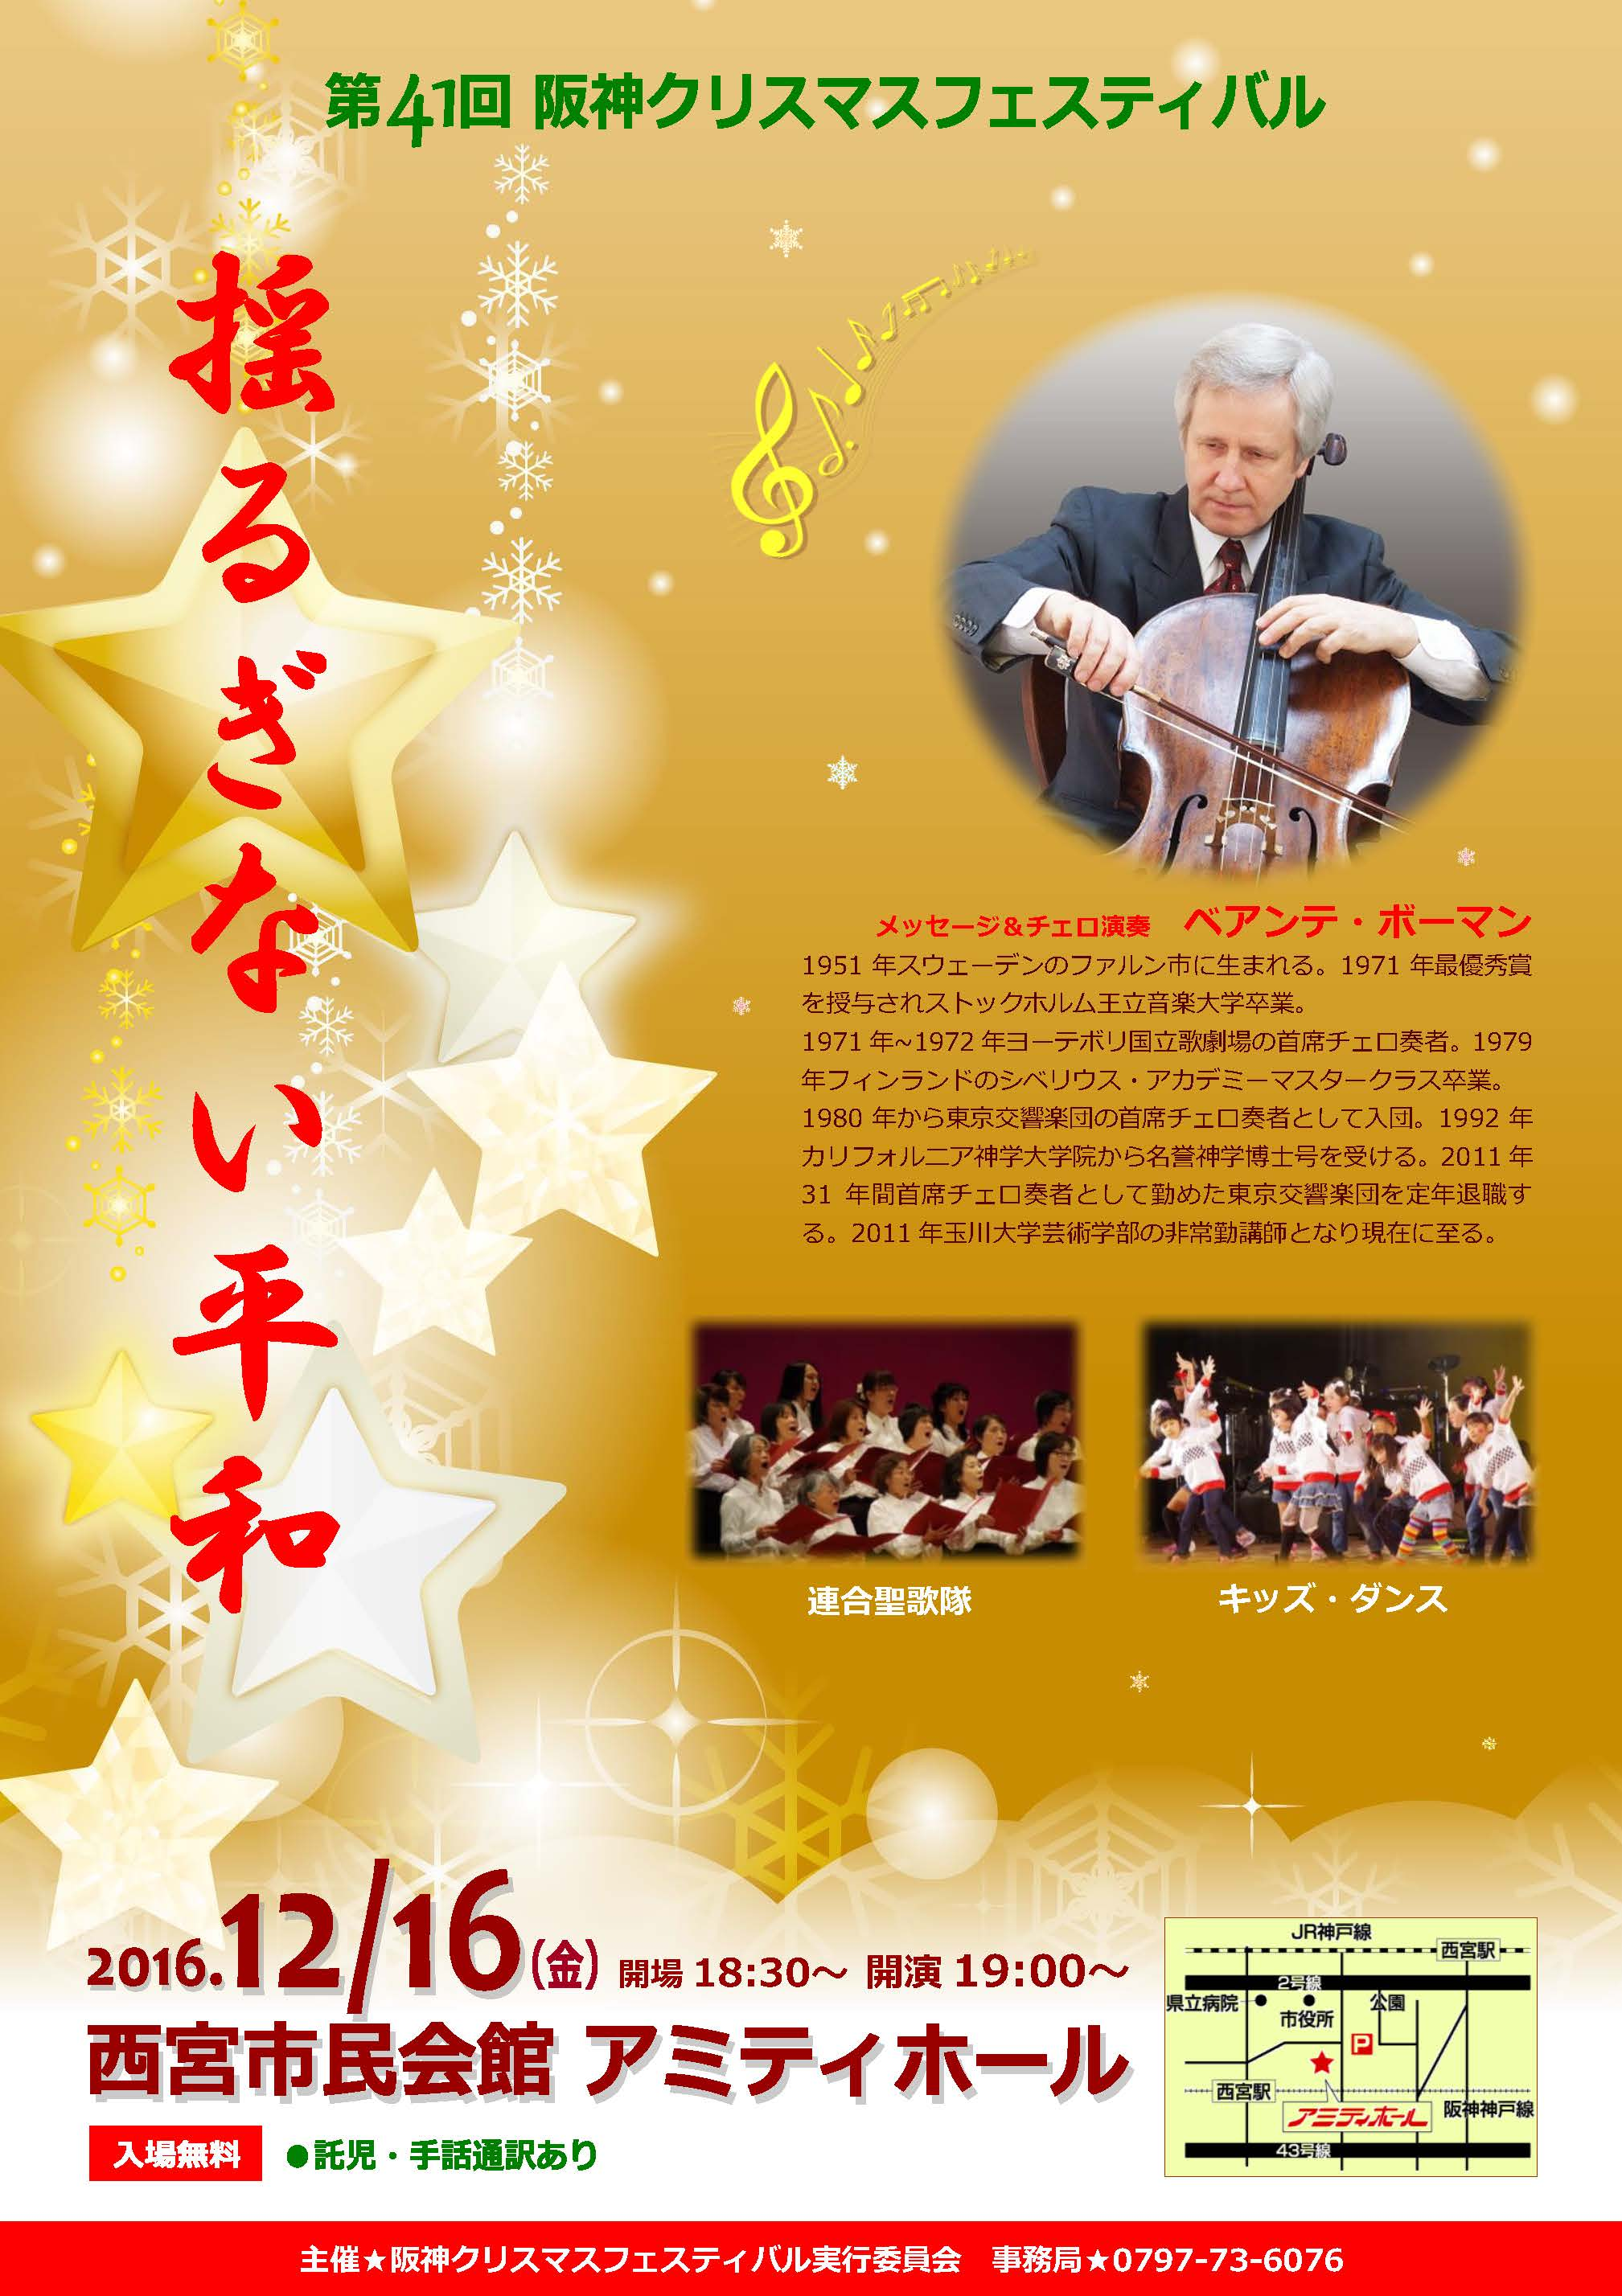 2016hanshinchristmasfestivalflyer